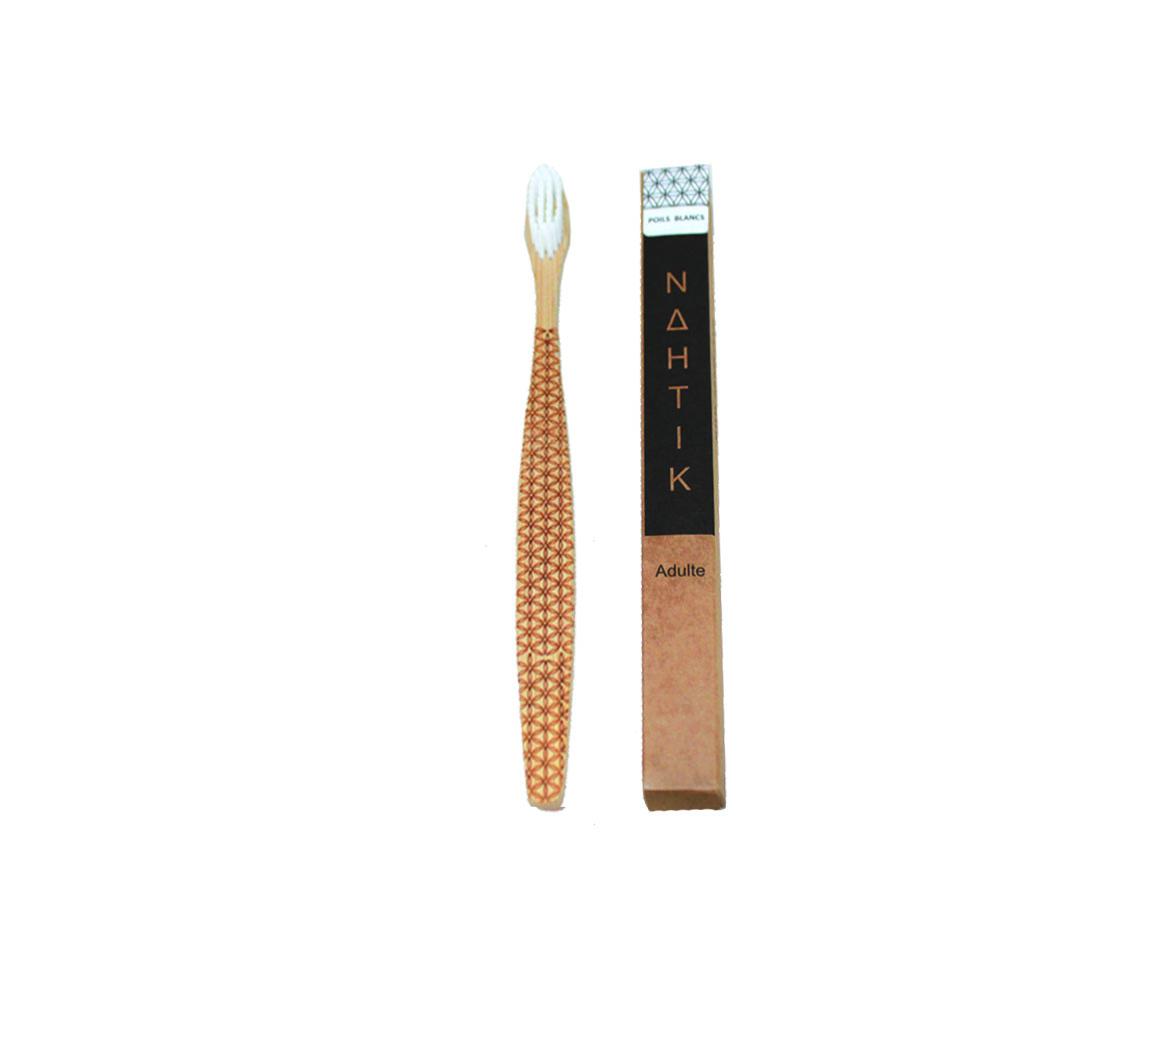 Brosse à dent gravée en bambou Brosse a dent gravée